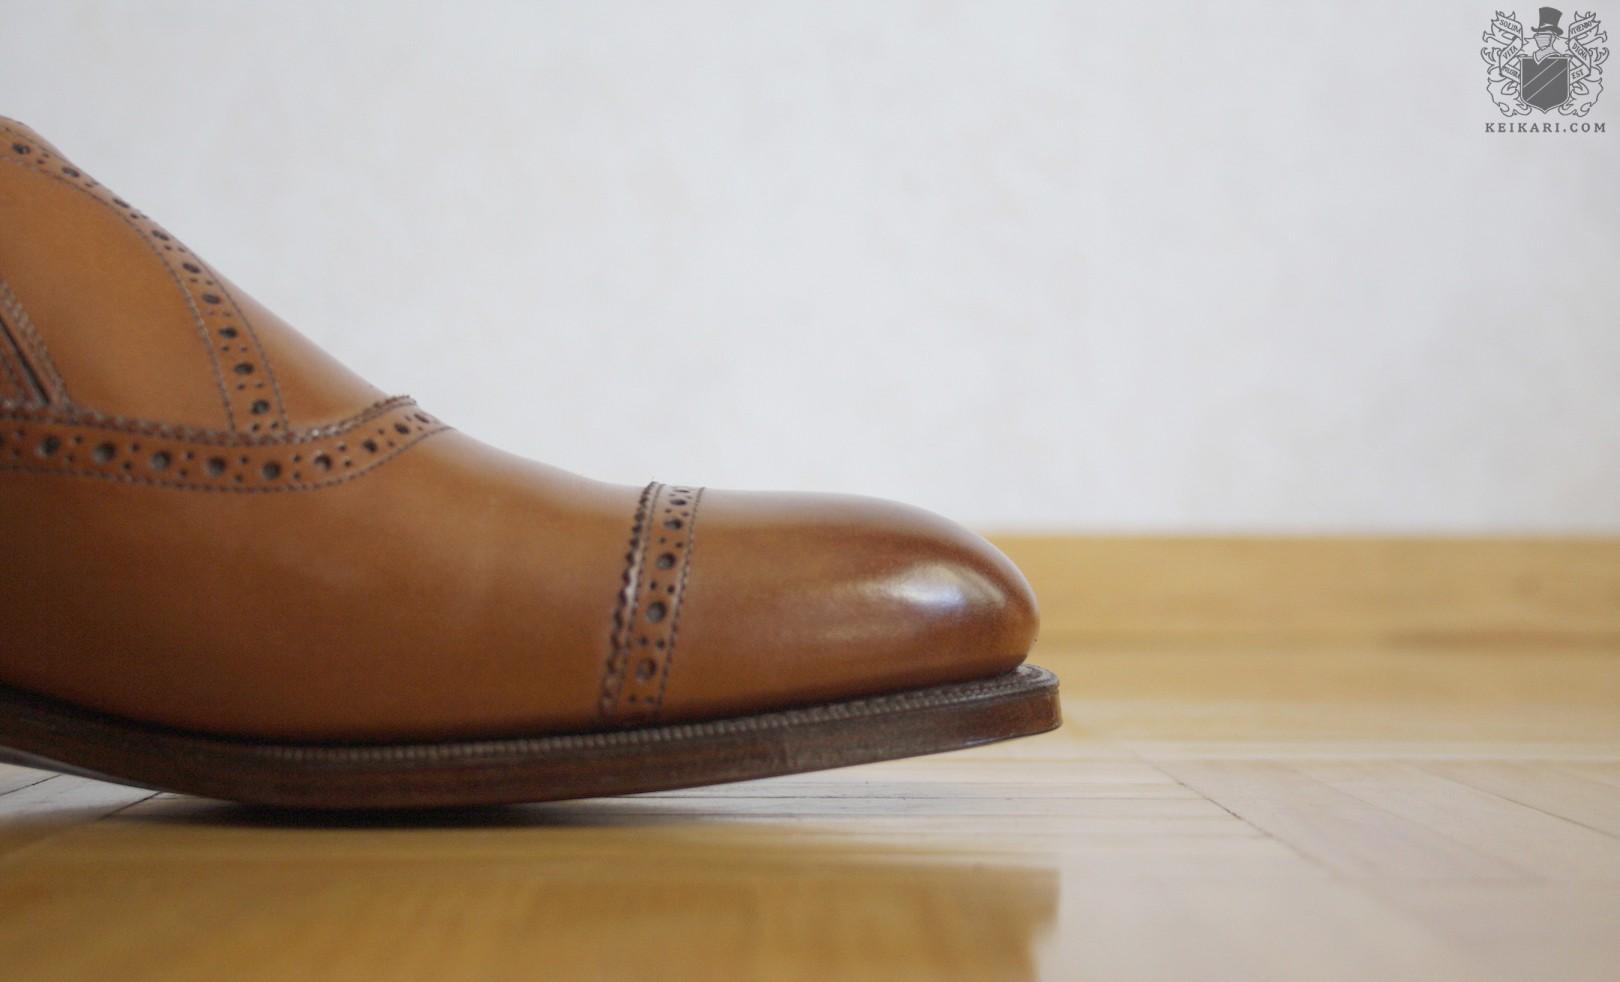 edward_green_kibworth_side_elastic_shoes_at_keikari_dot_com09